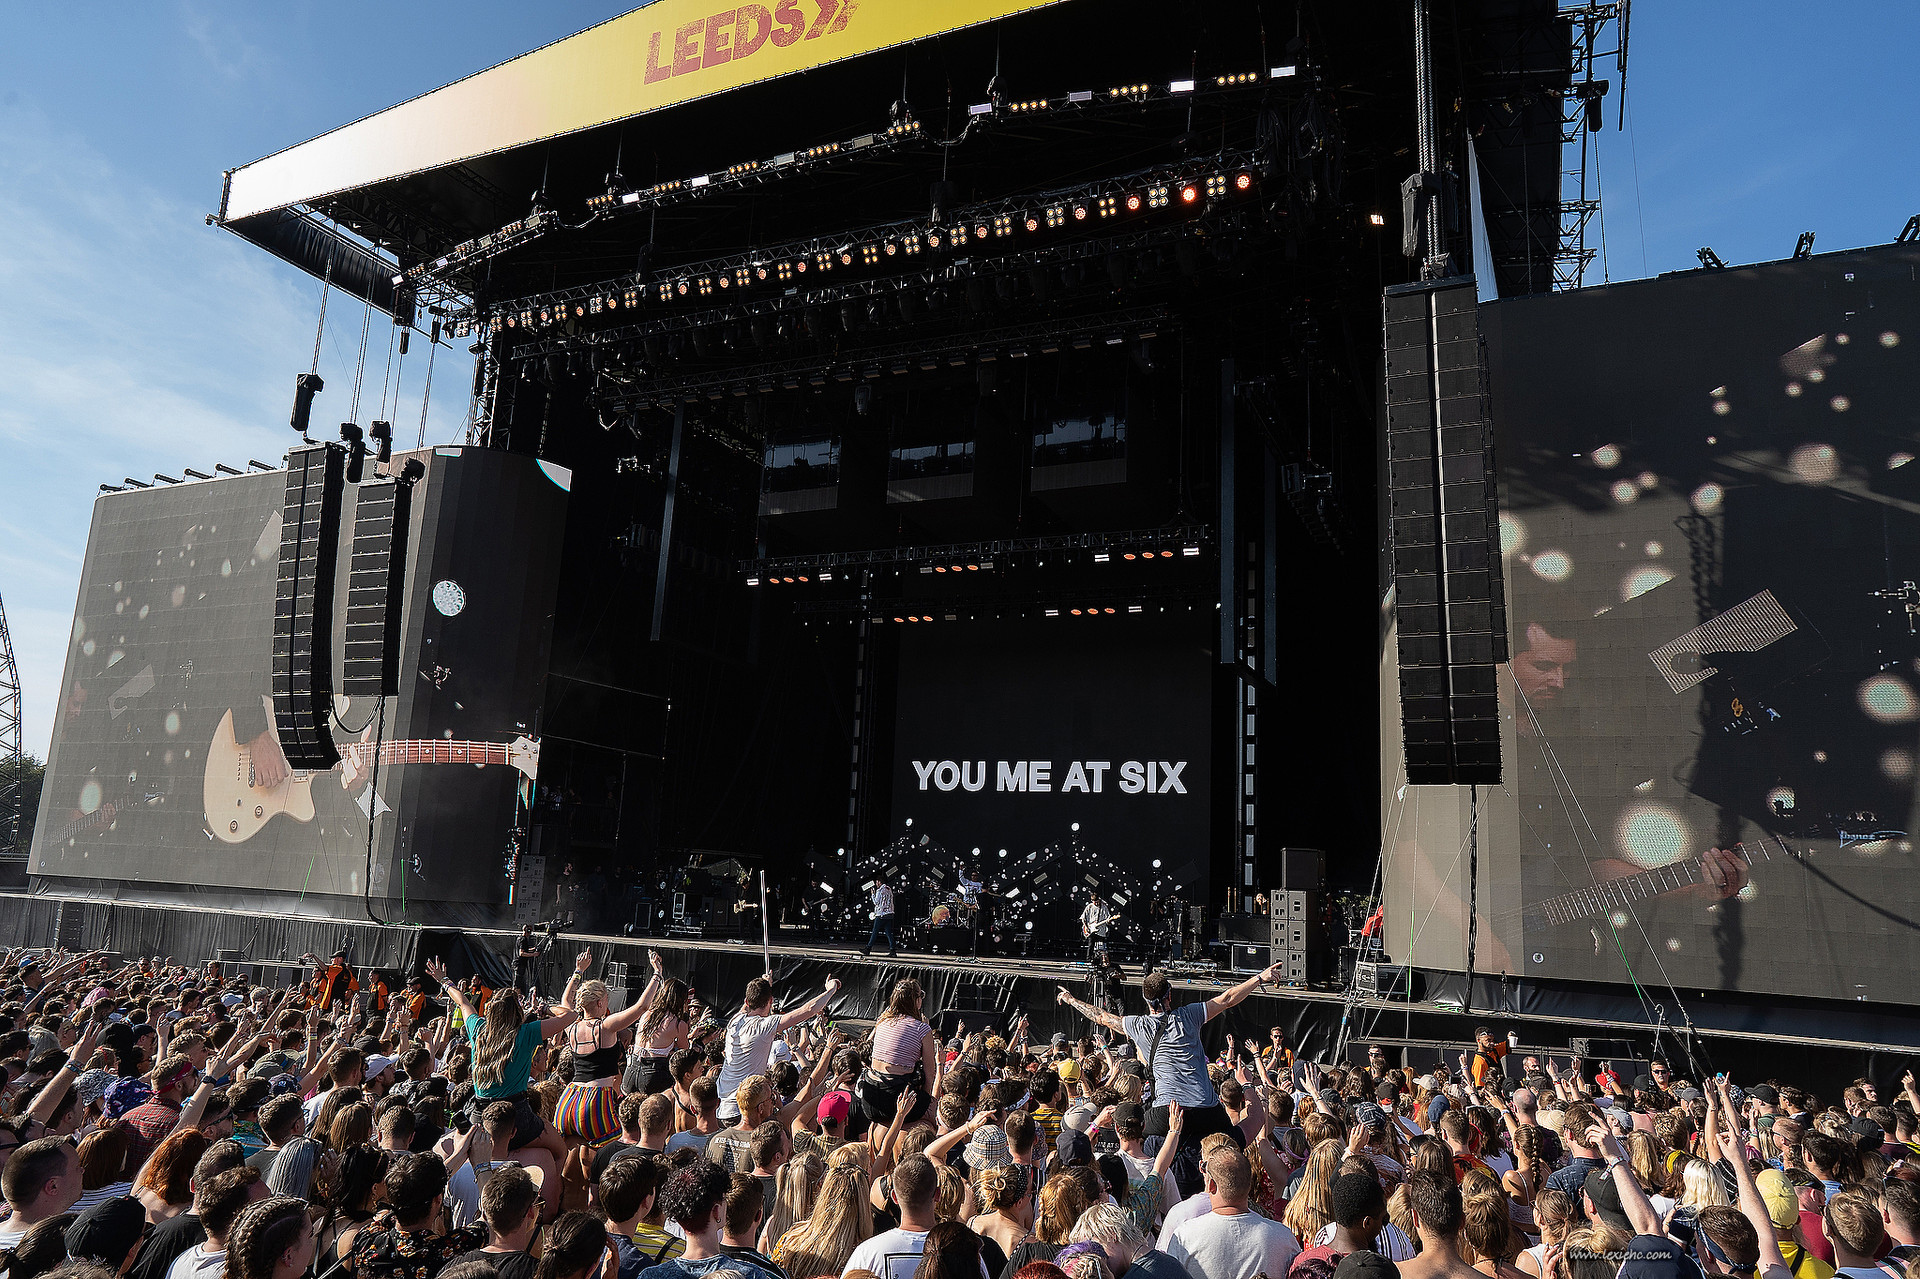 Leeds Festival, UK